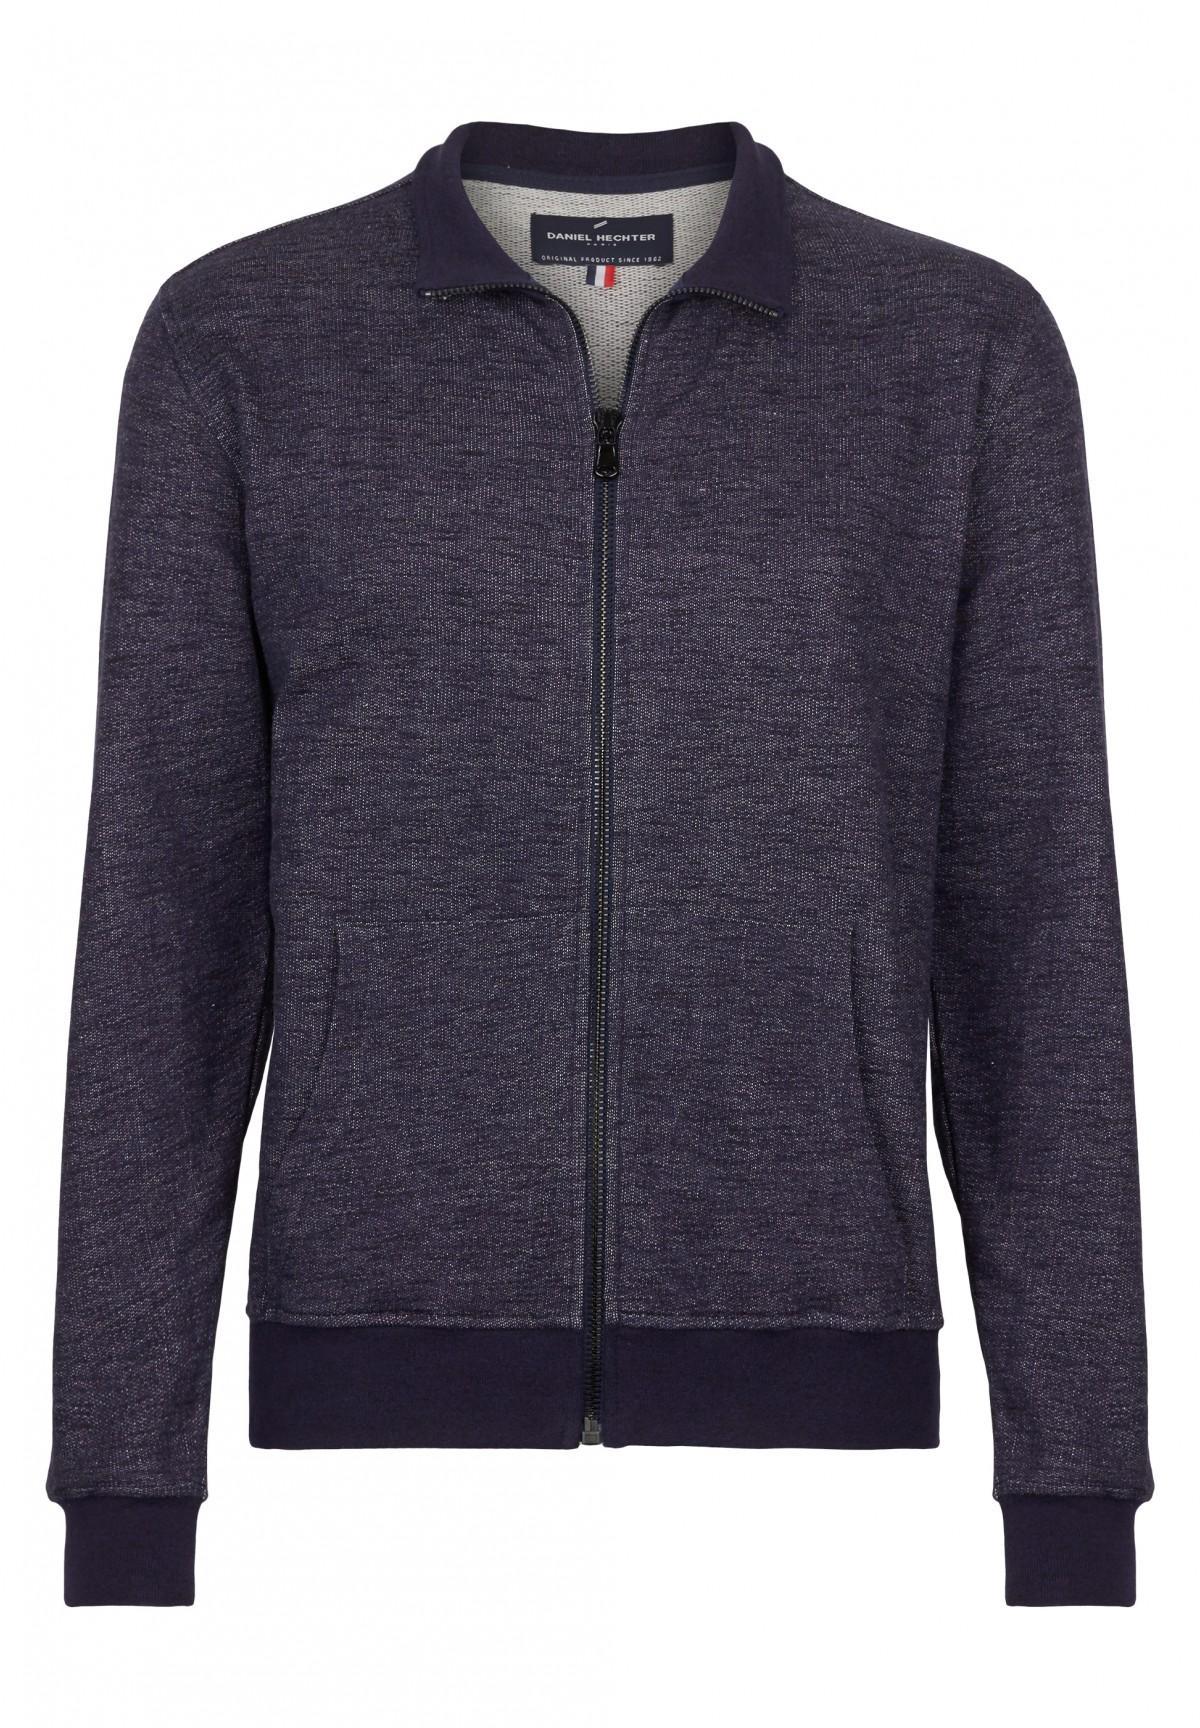 Sweatshirt Gilet zippé /